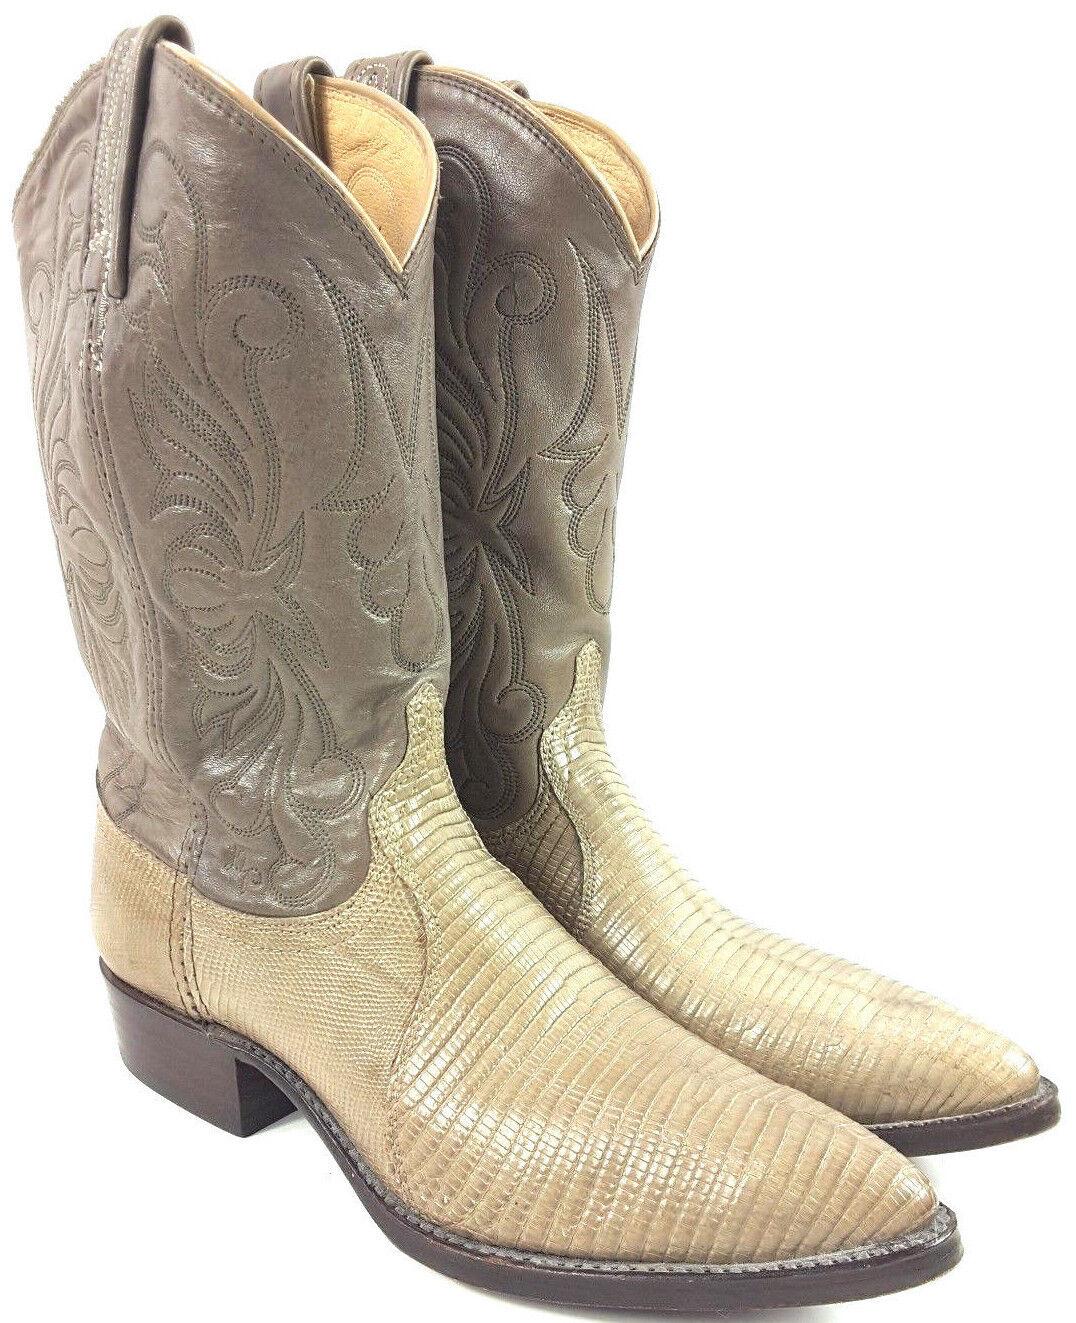 Women's DAN POST Sz 7.5M Cream color Exotic Lizard skin Cowgirl Boots 4262